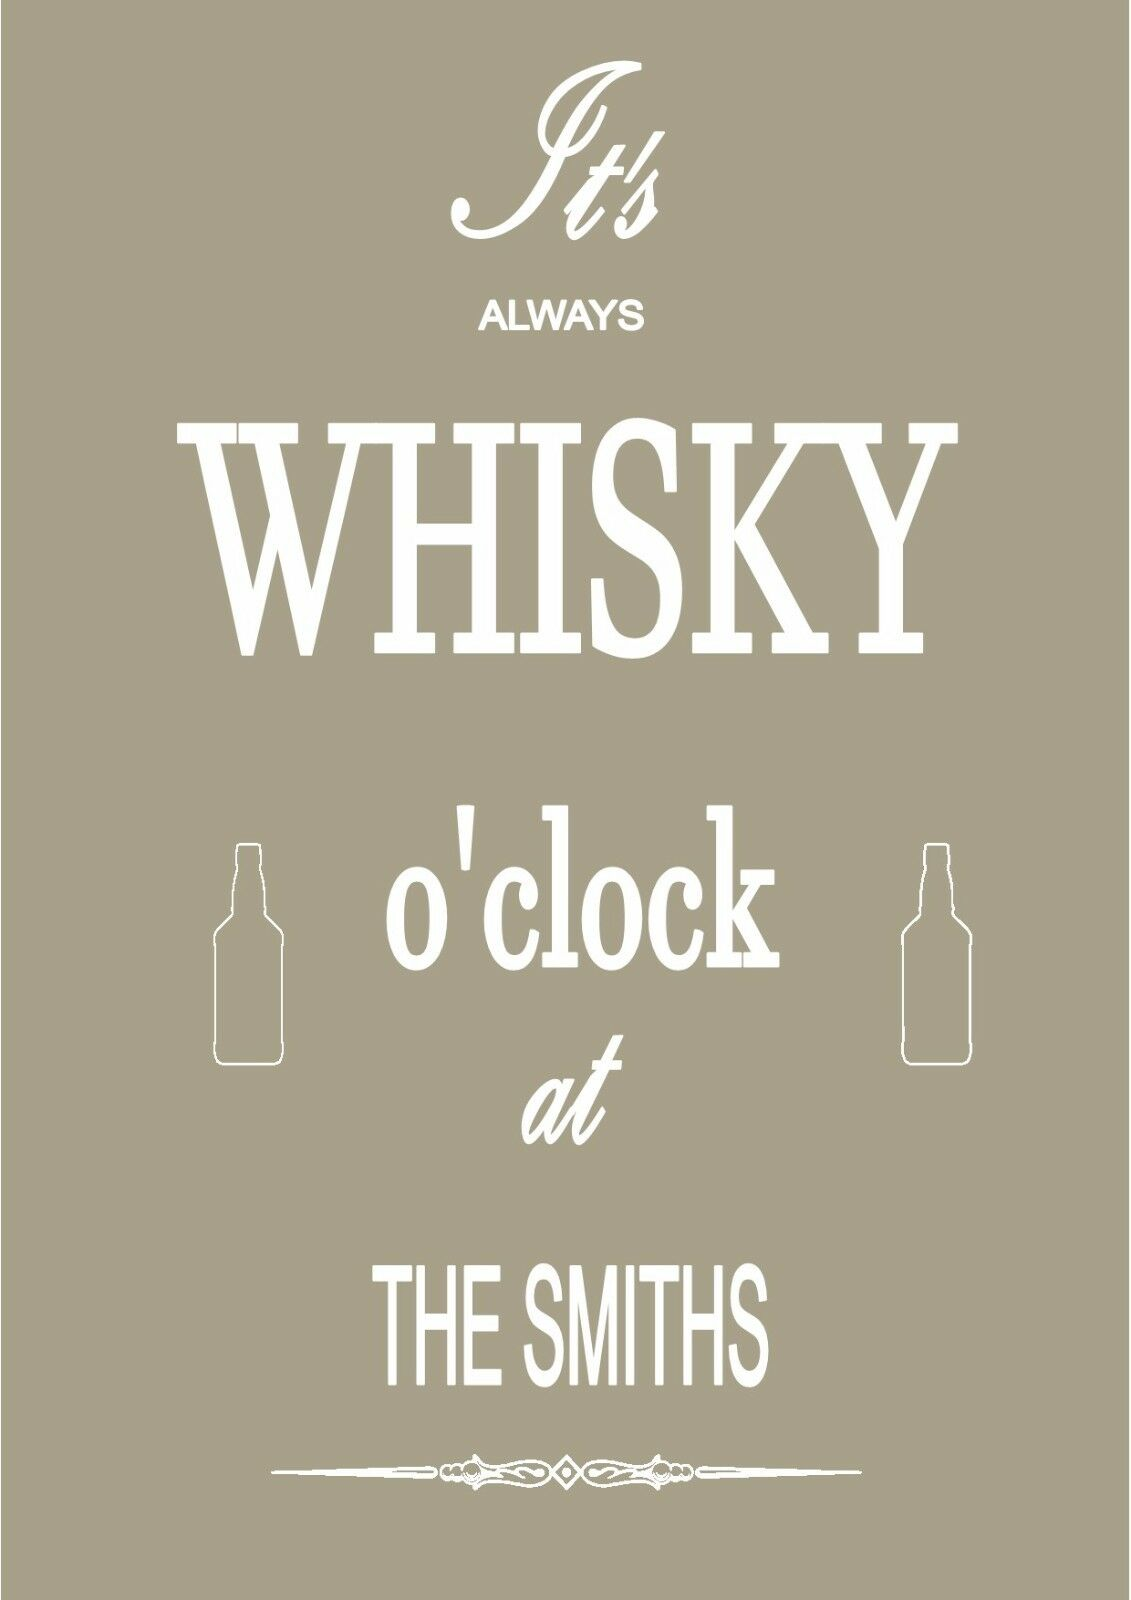 Personalizado 'Whisky O' CLOCK 'A4 vibrante impresión (Sin marco) Fiesta, Cumpleaños